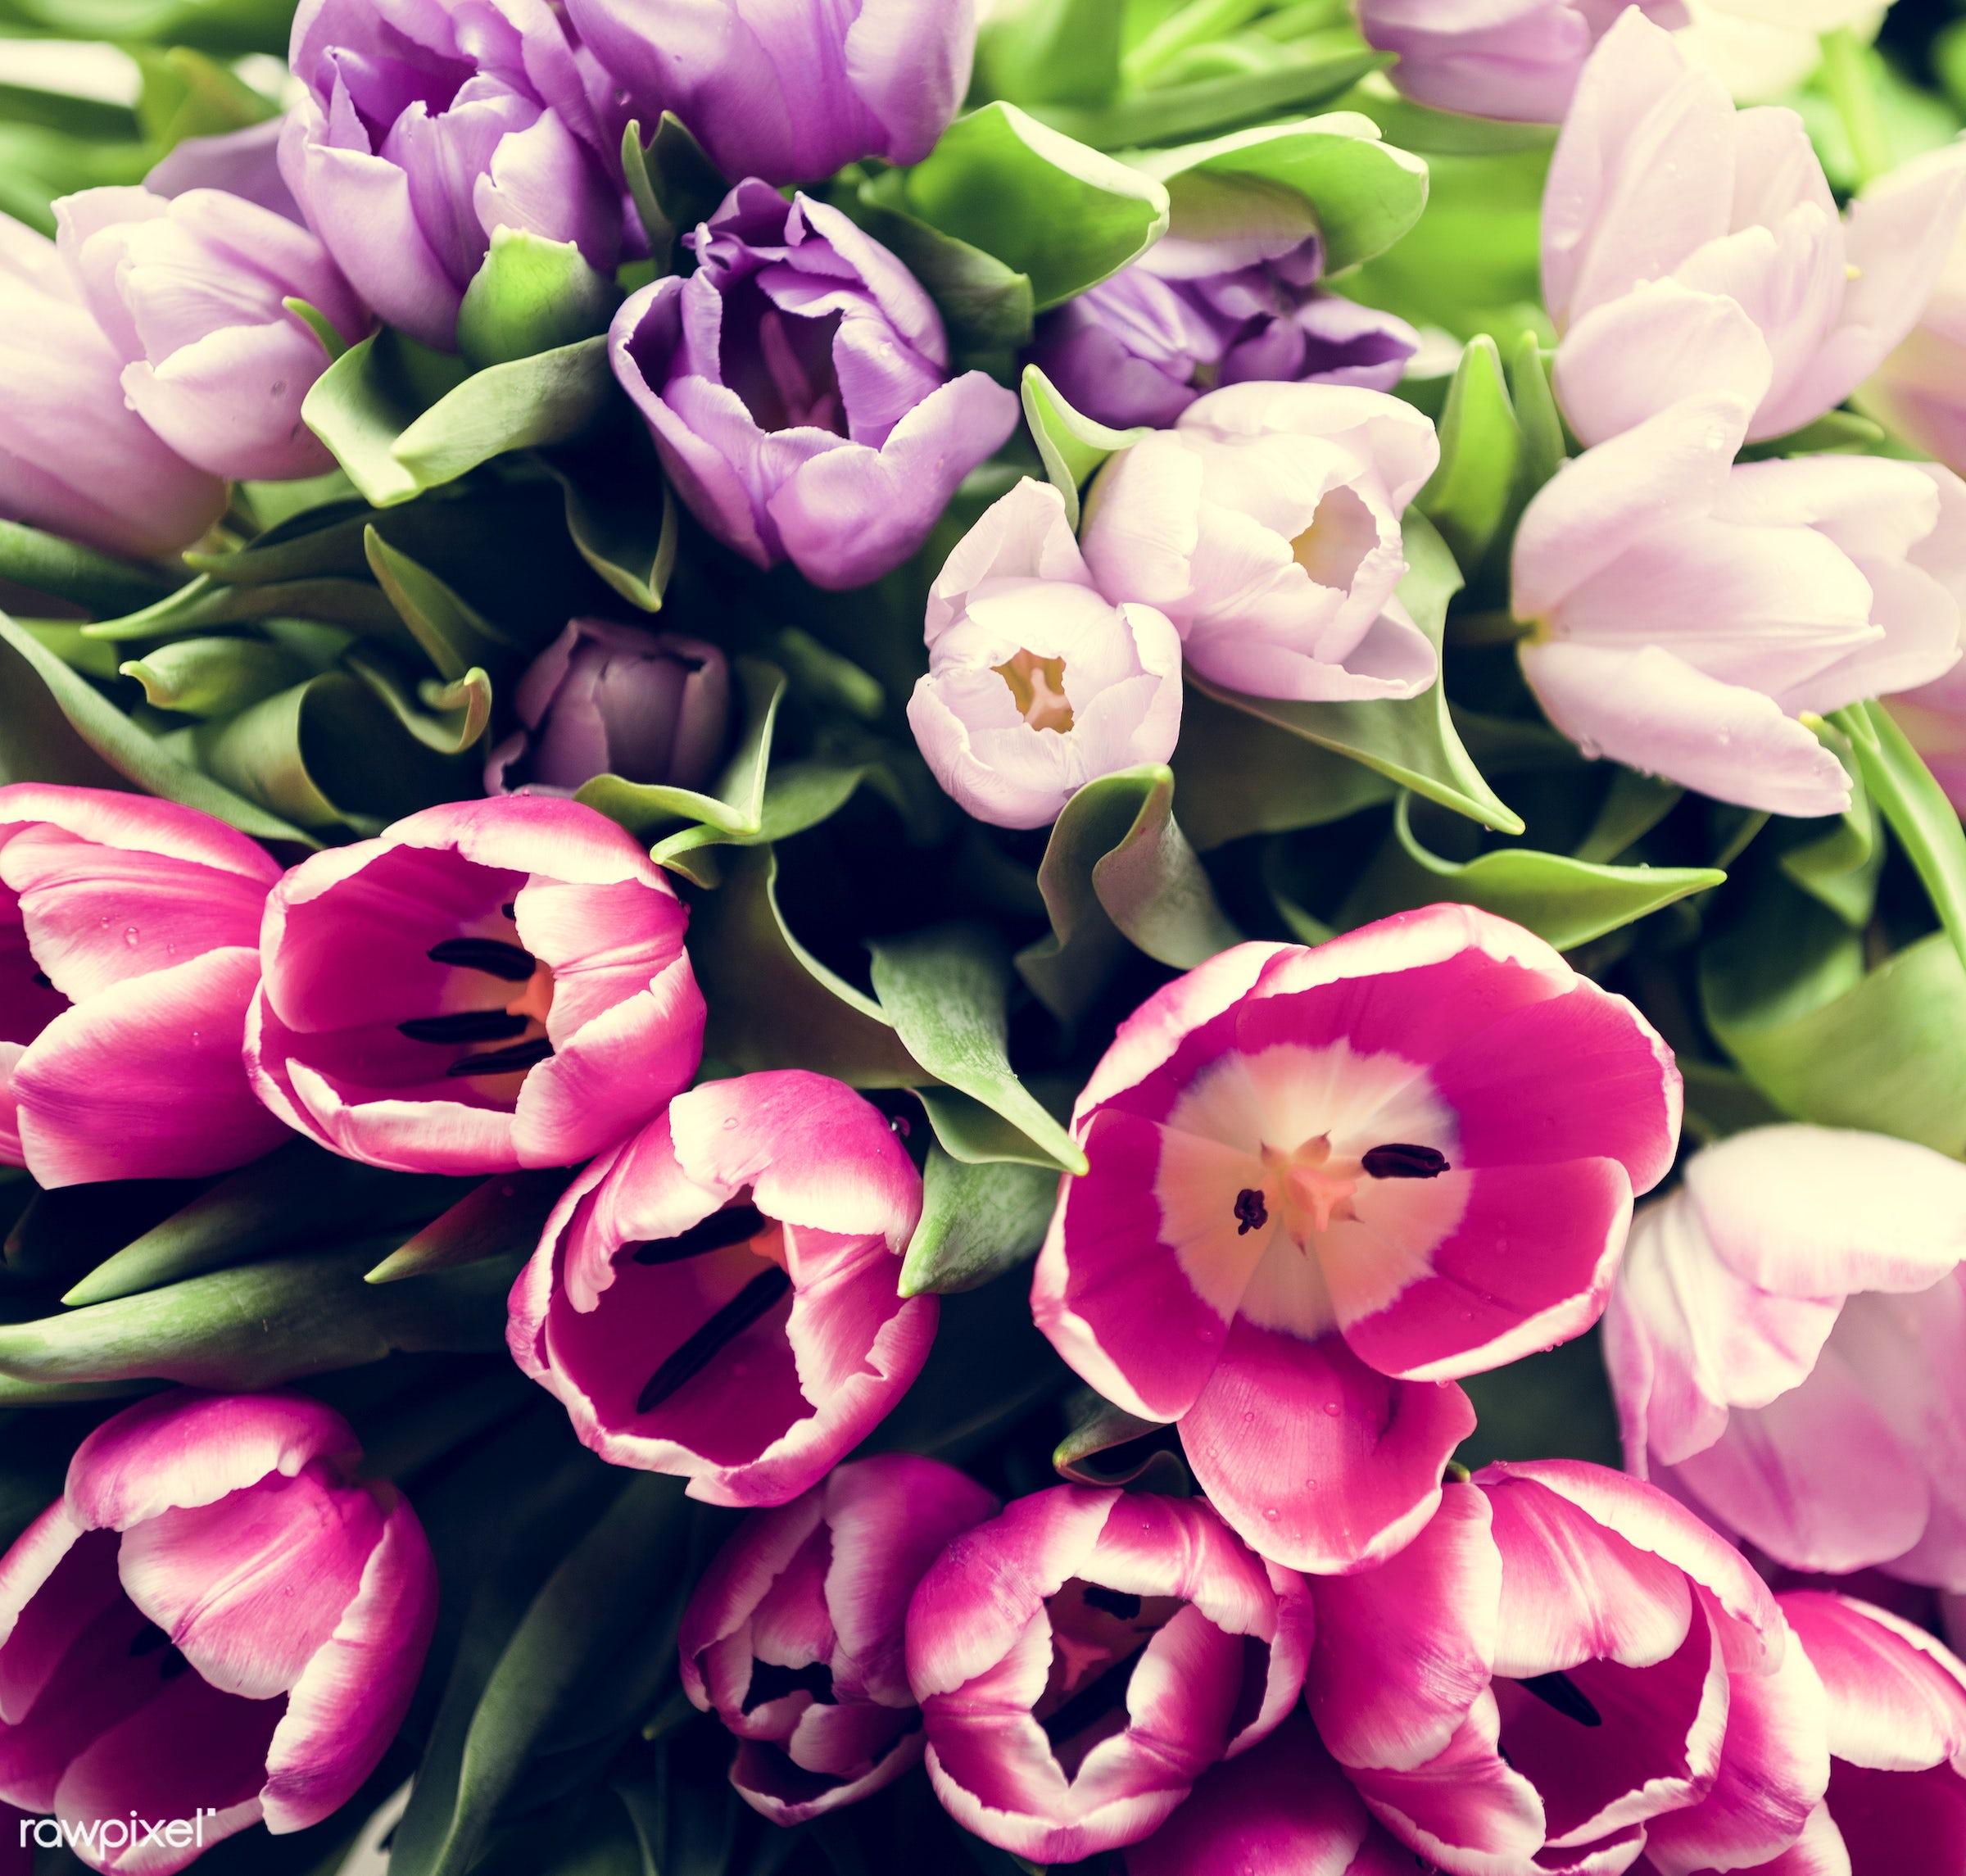 nobody, festive, detail, decorative, diverse, colorful, events, plants, tulips, leaf, leaves, spring, blossom, decor, nature...